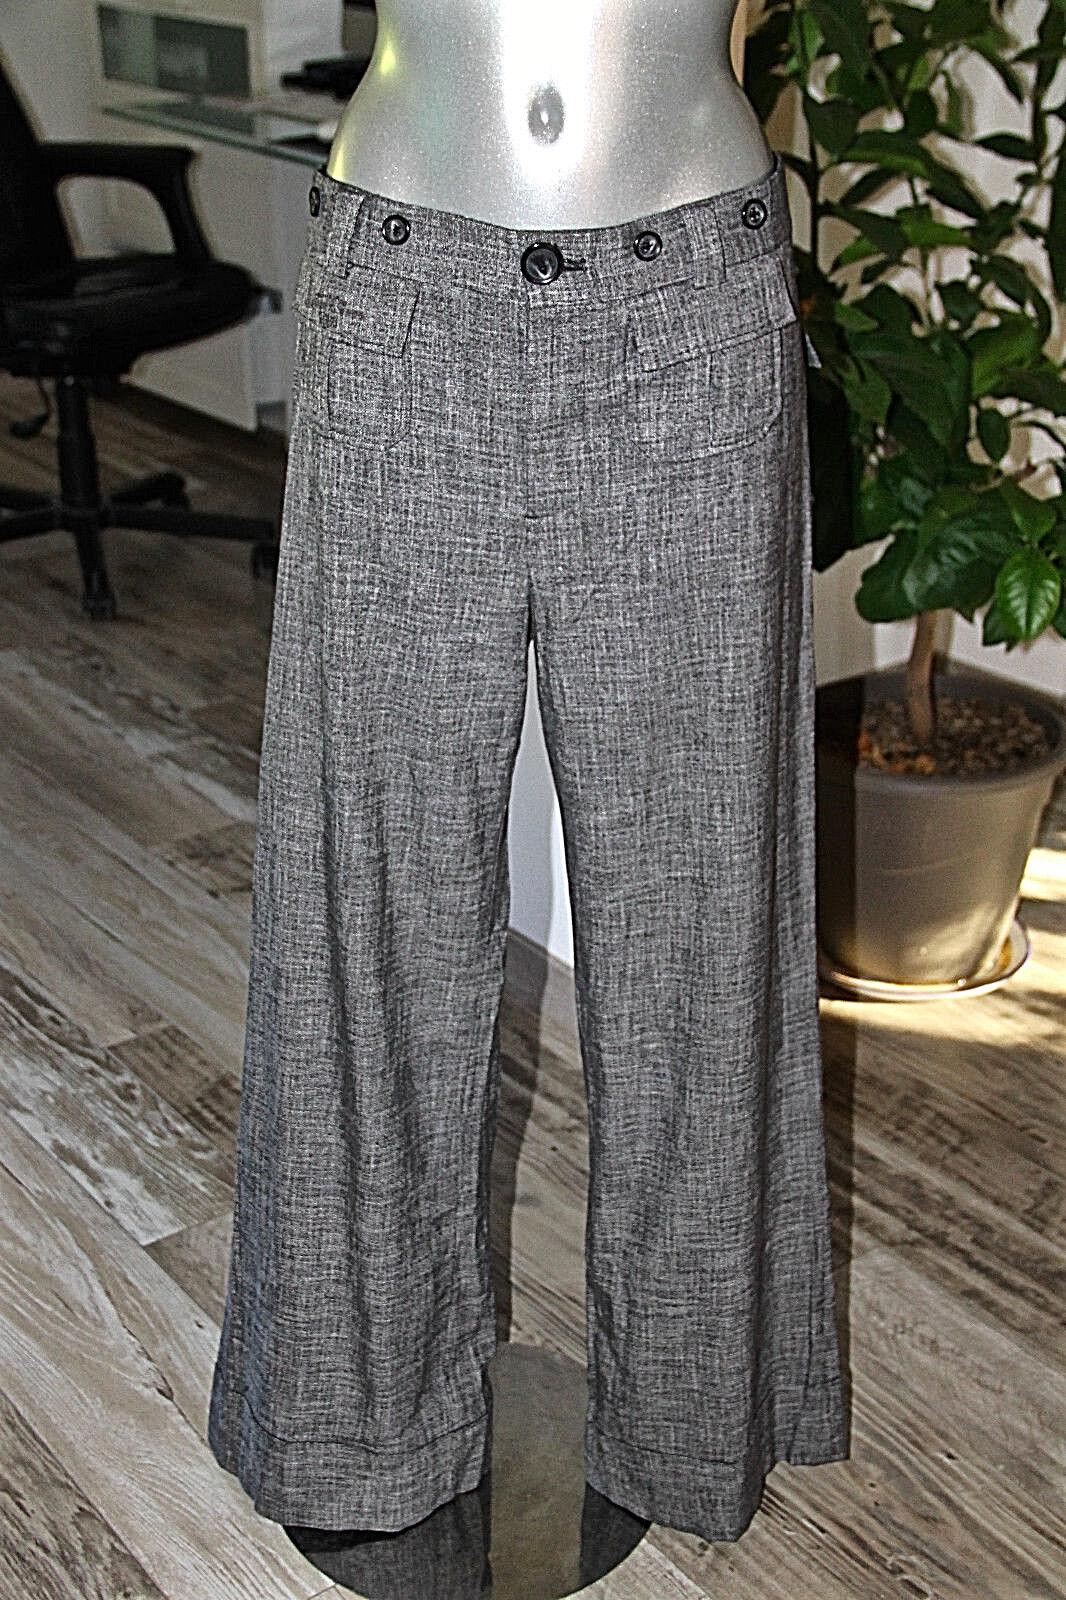 COP COPINE COPINE COPINE joli pantalon viscose modèle lucky Dimensione 40 fr 44i   COMME NEUF 45fd65